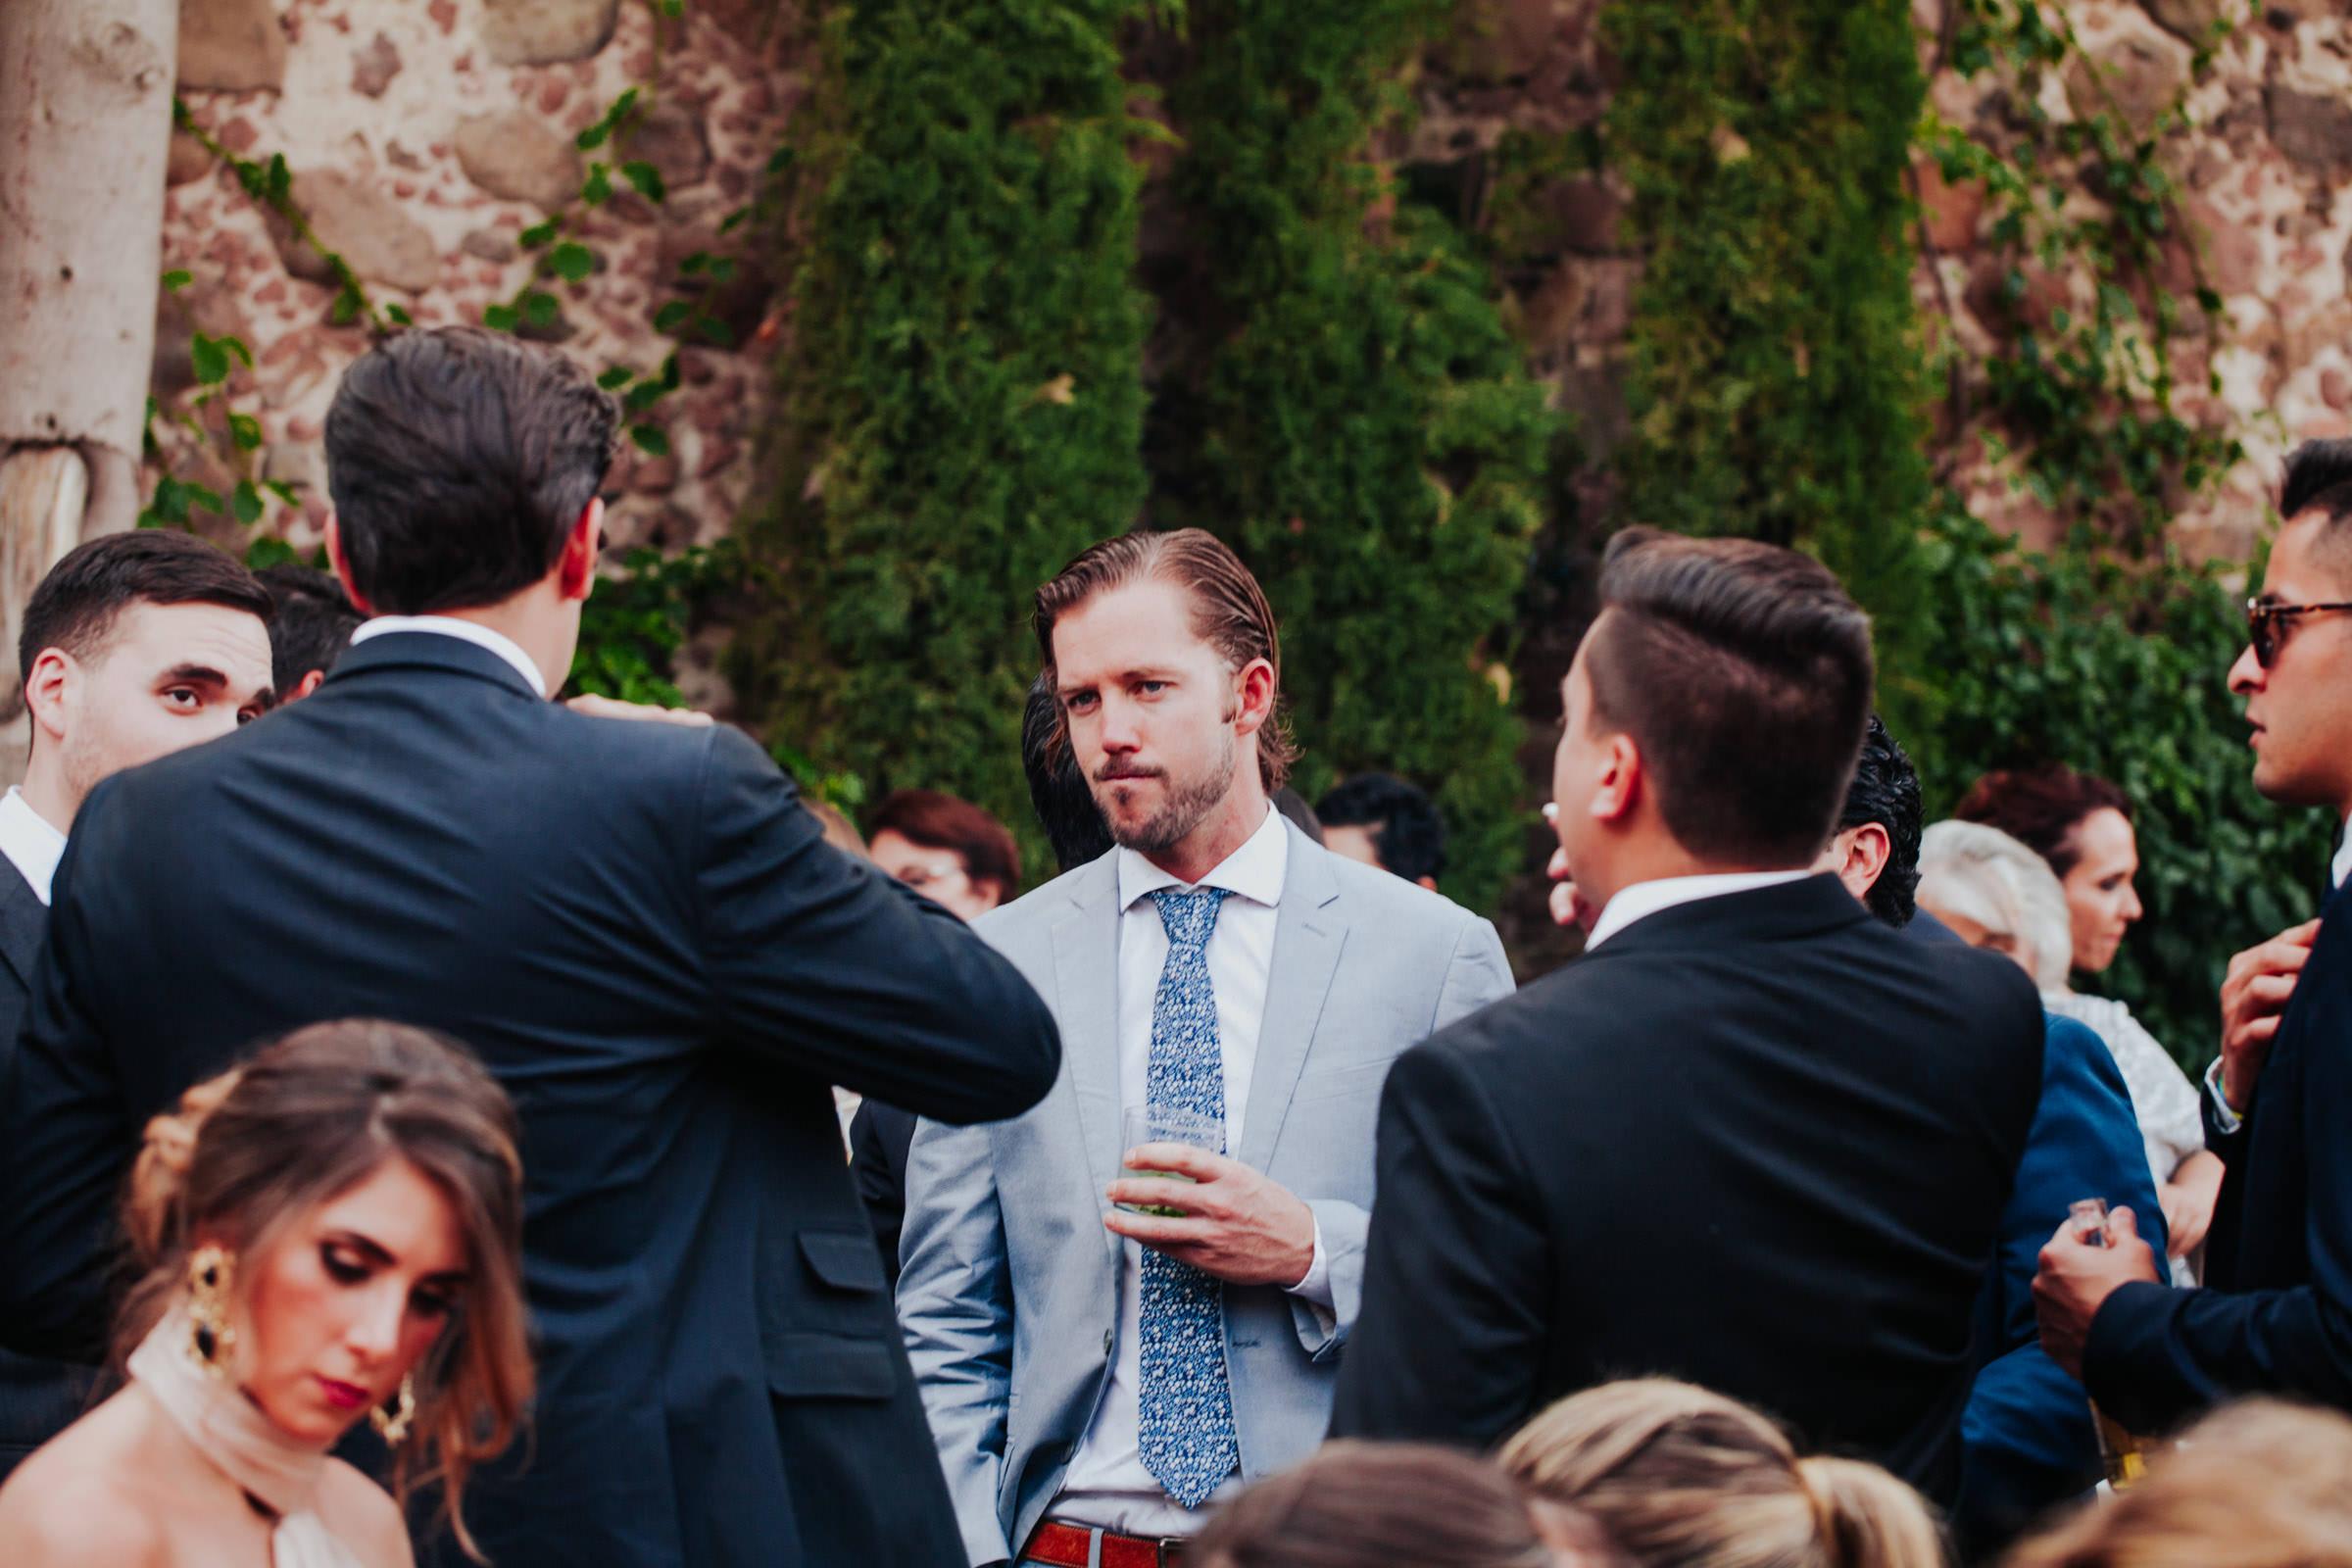 San-Miguel-de-Allende-Wedding-Photography-Parroquia-Instituto-Boda-Fotografia-Fer-Sergio-Pierce-Lifestyle-Photography0005.JPG